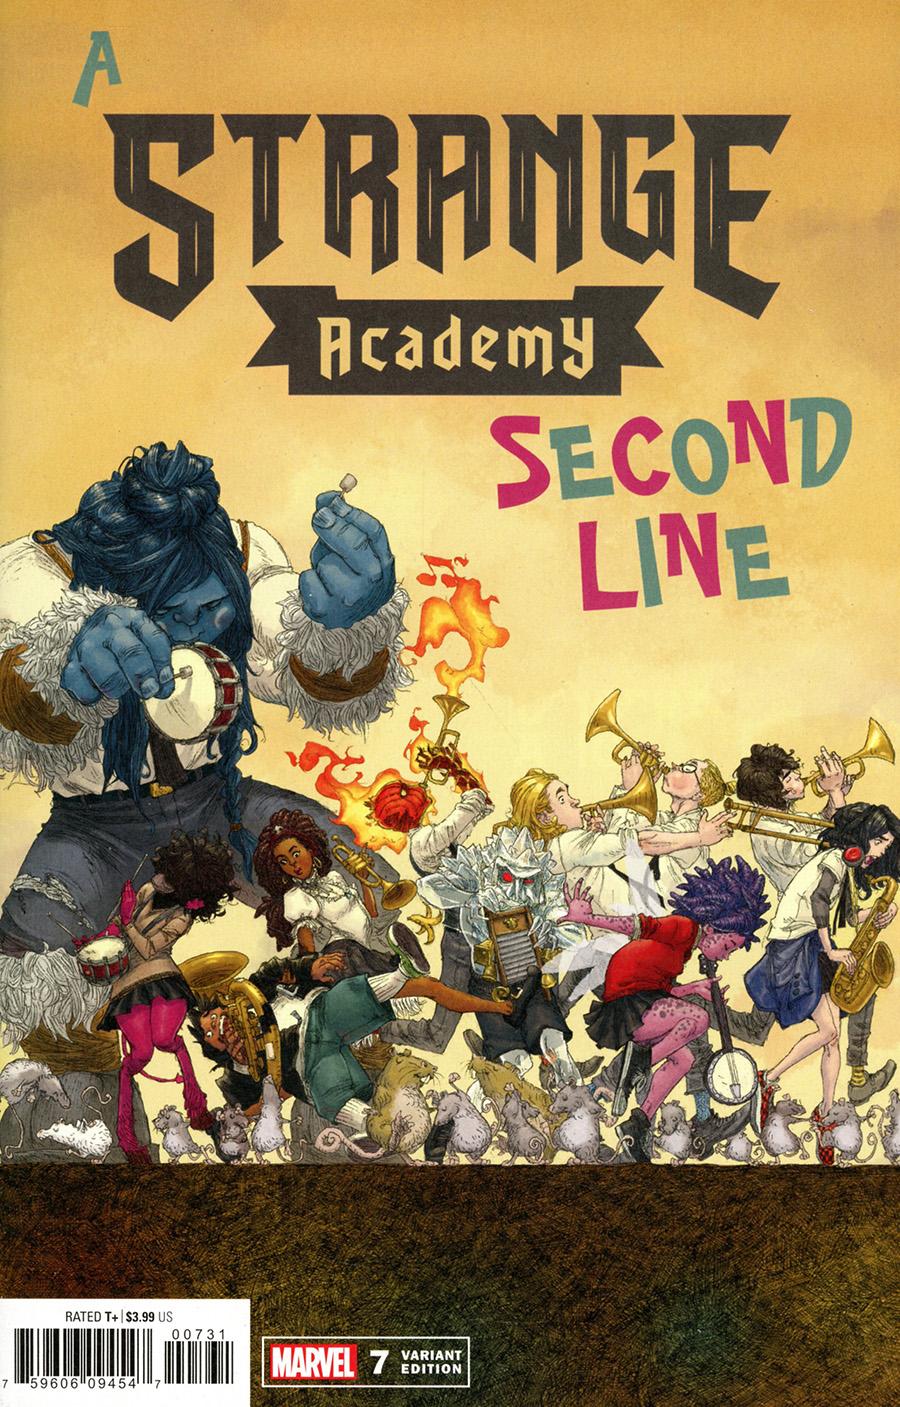 Strange Academy #7 Cover C Variant Adrian Alphona Cover (Limit 1 Per Customer)